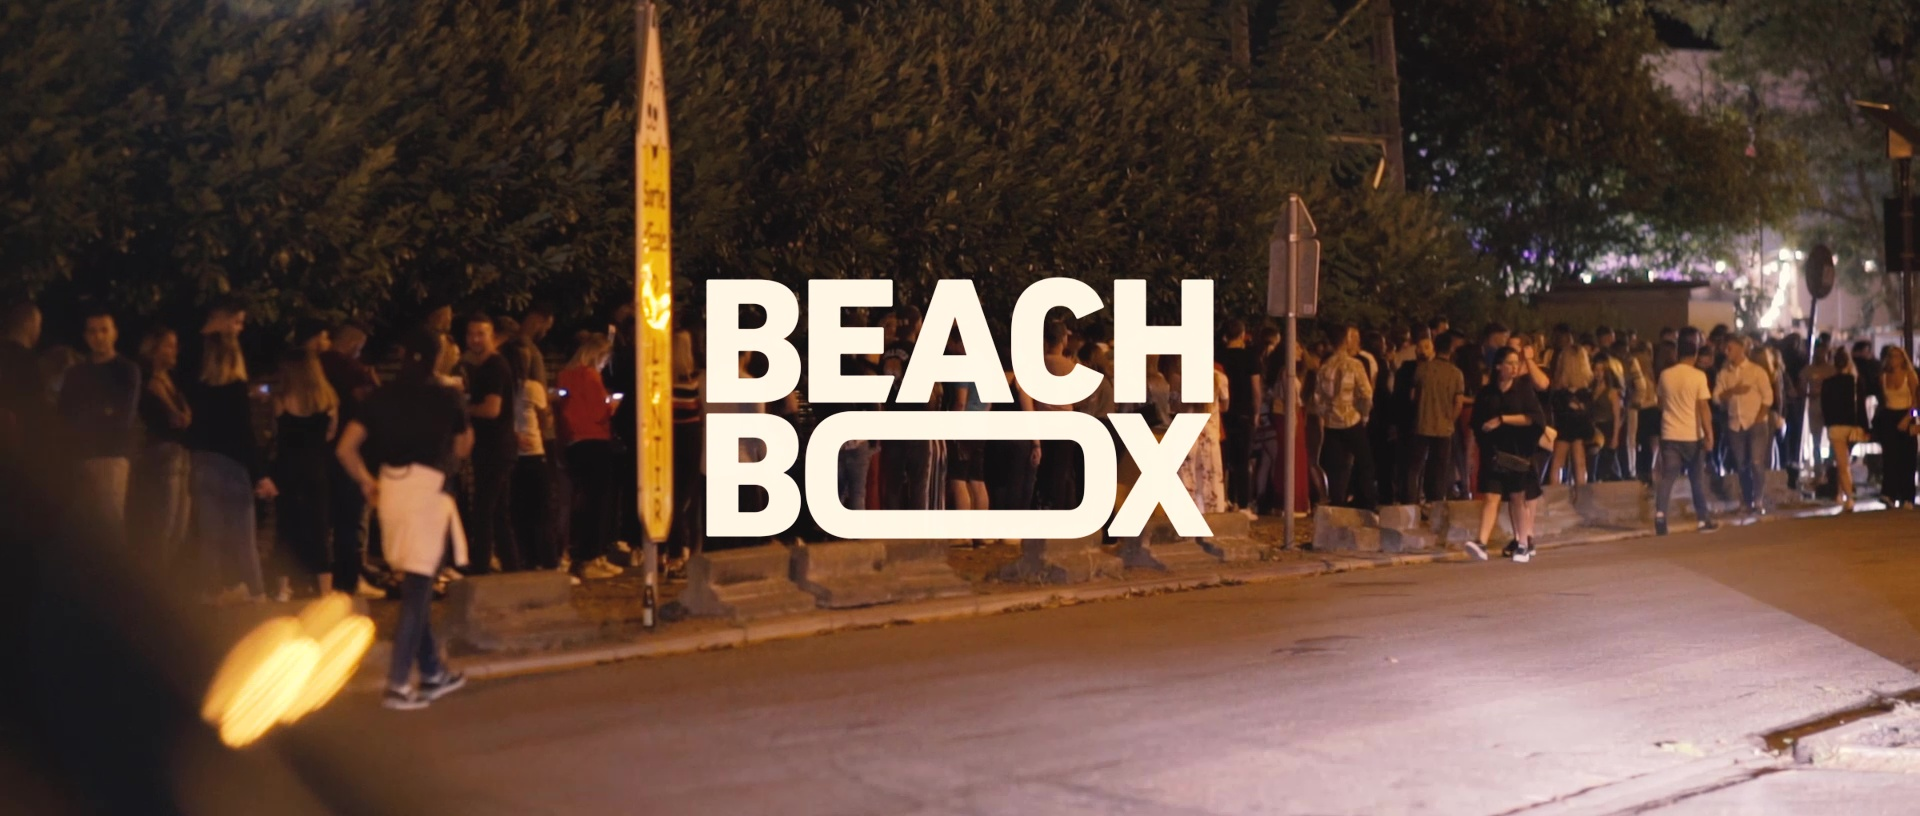 BeachBox18_SylvainArmand_00001